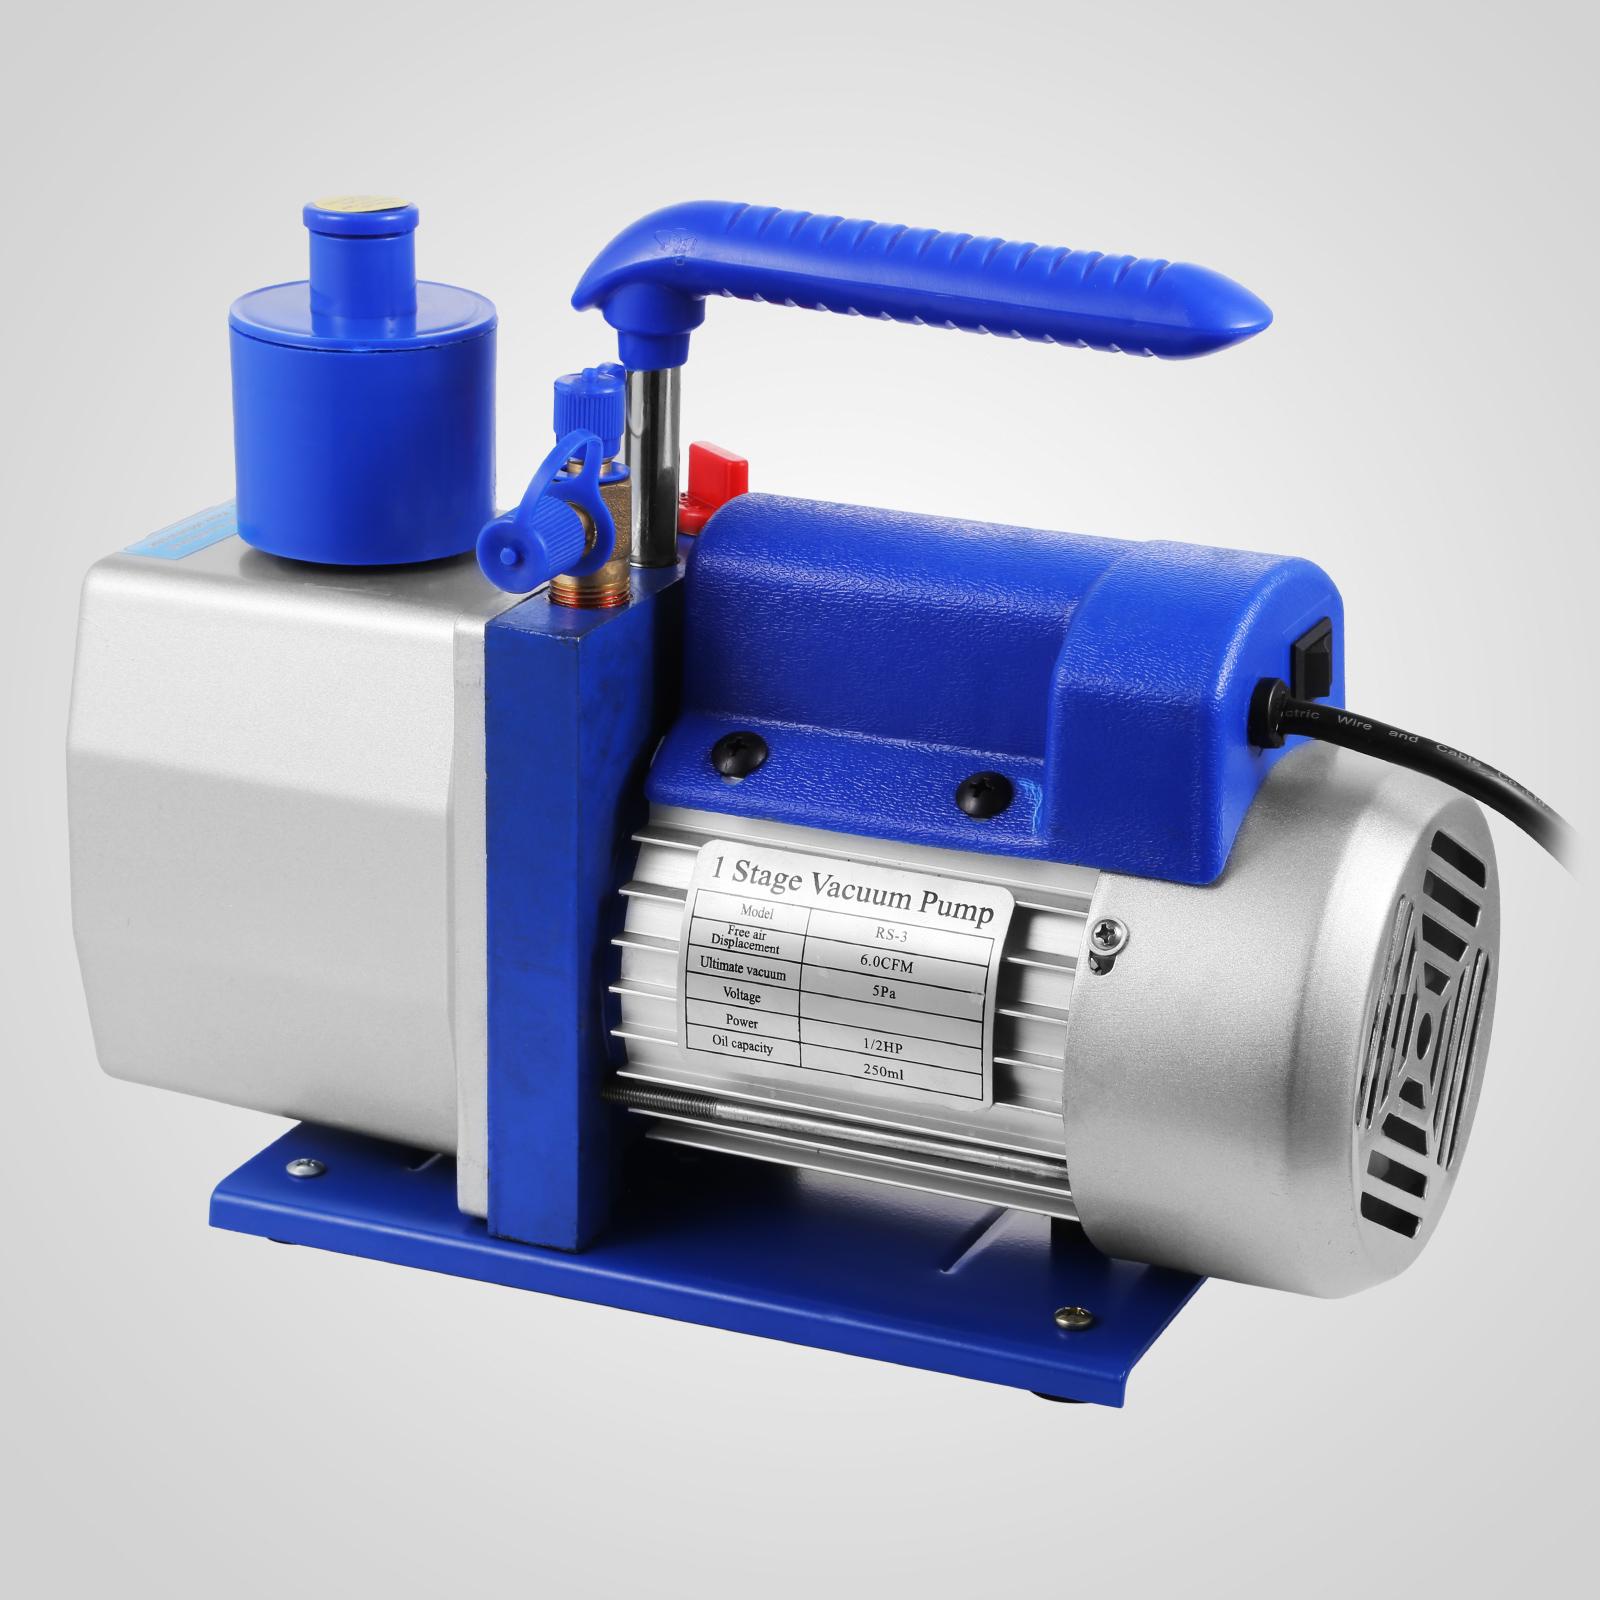 thumbnail 29 - 1-8CFM-3CFM-6CFM-9CFM-Refrigeration-Vacuum-Pump-1-Stage-HVAC-Air-Conditioning